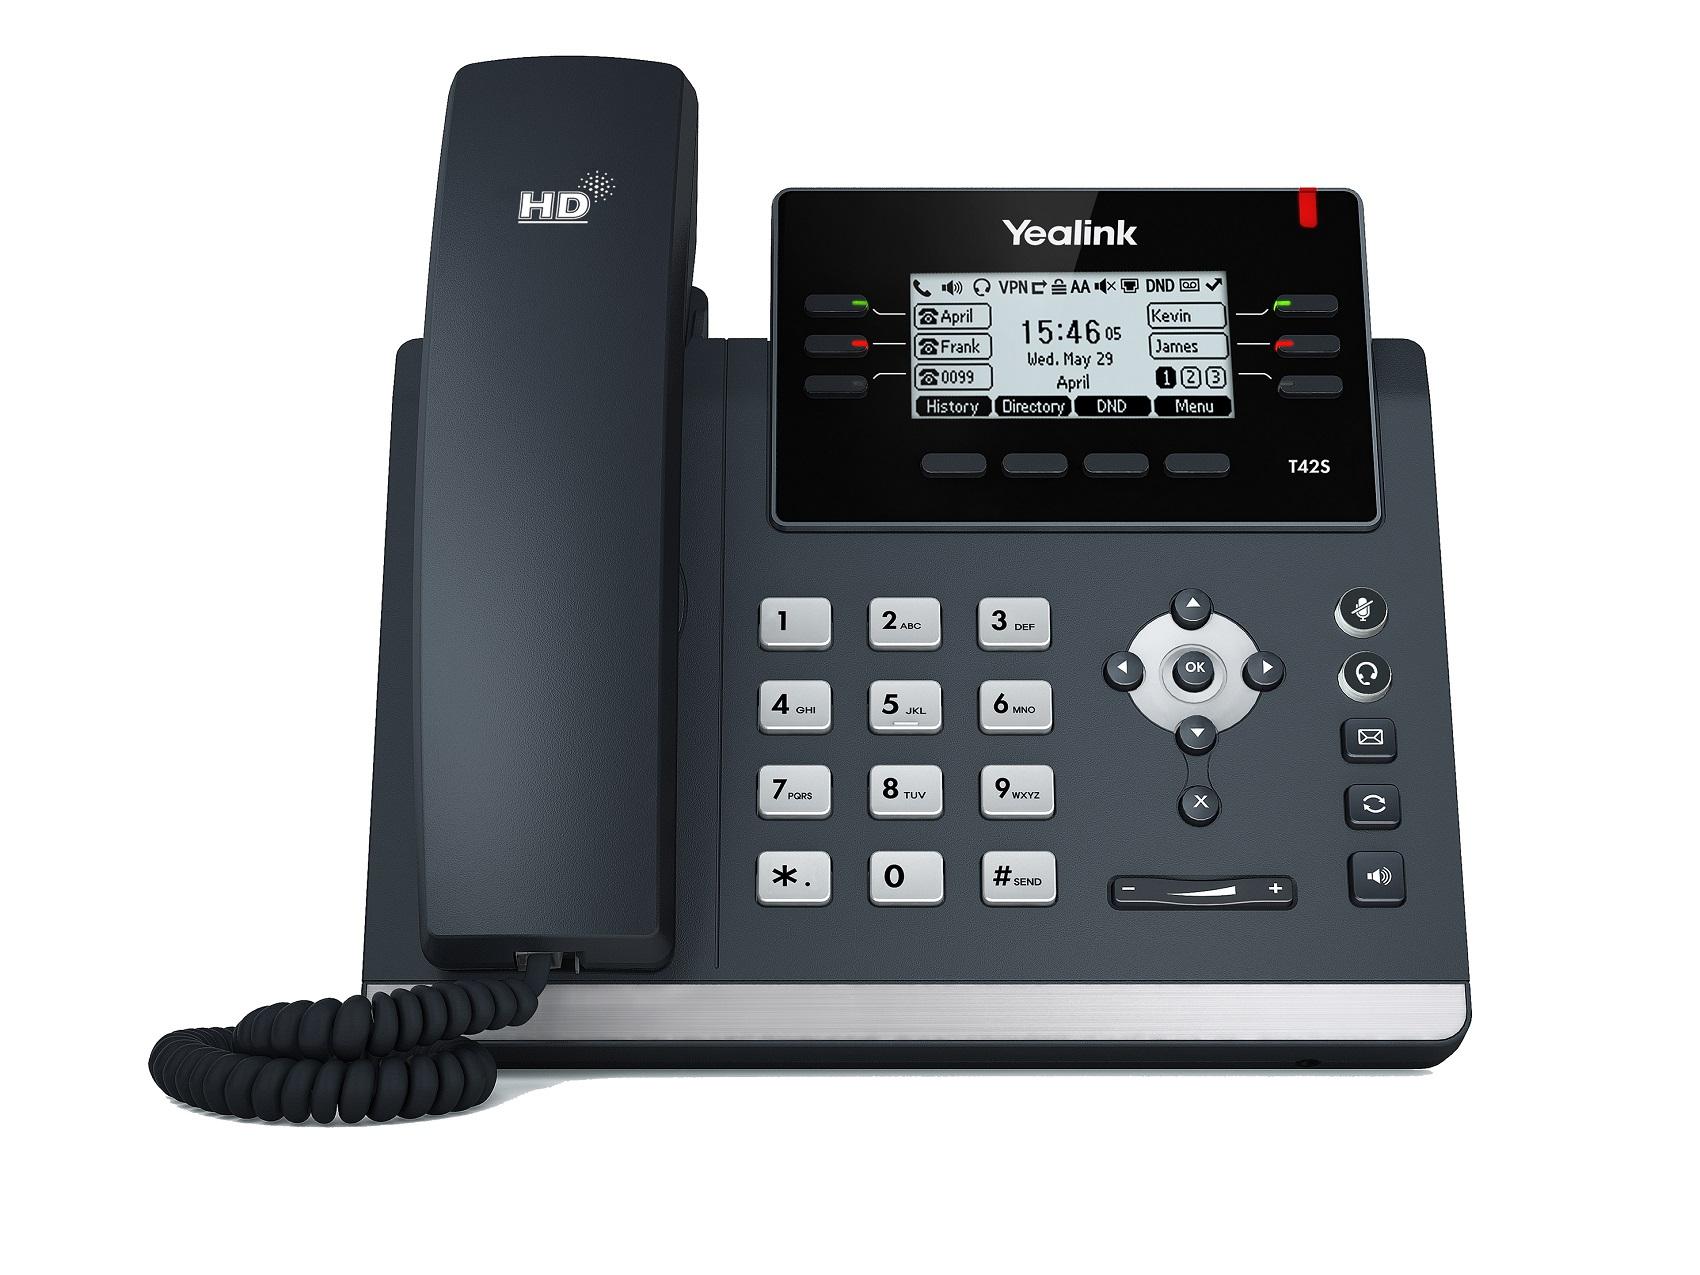 Yealink T42S Business Gigabit IP Phone